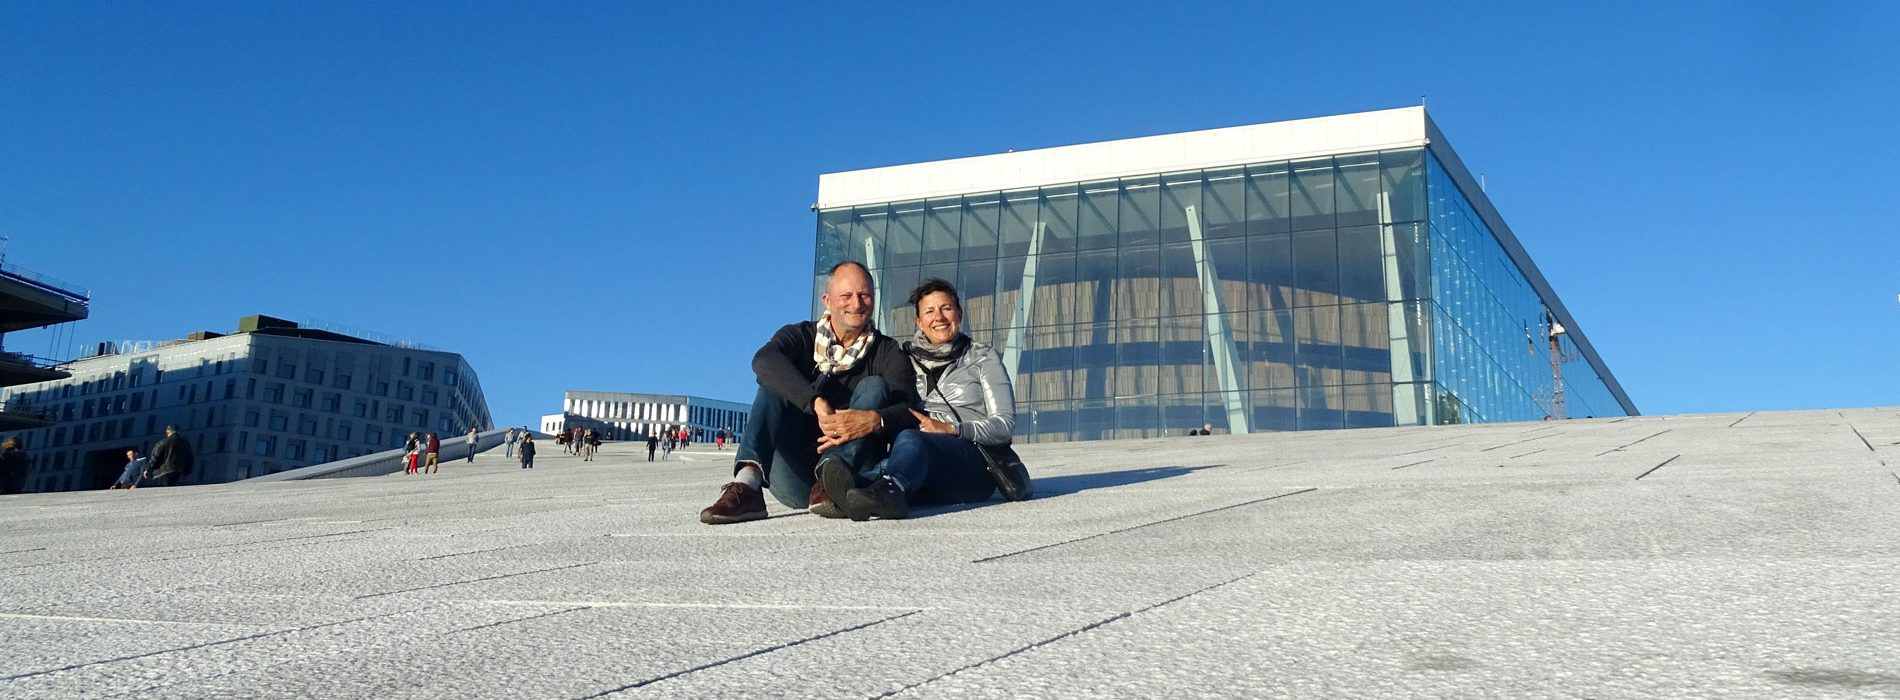 Oslo-Header-Operahouse--N+G